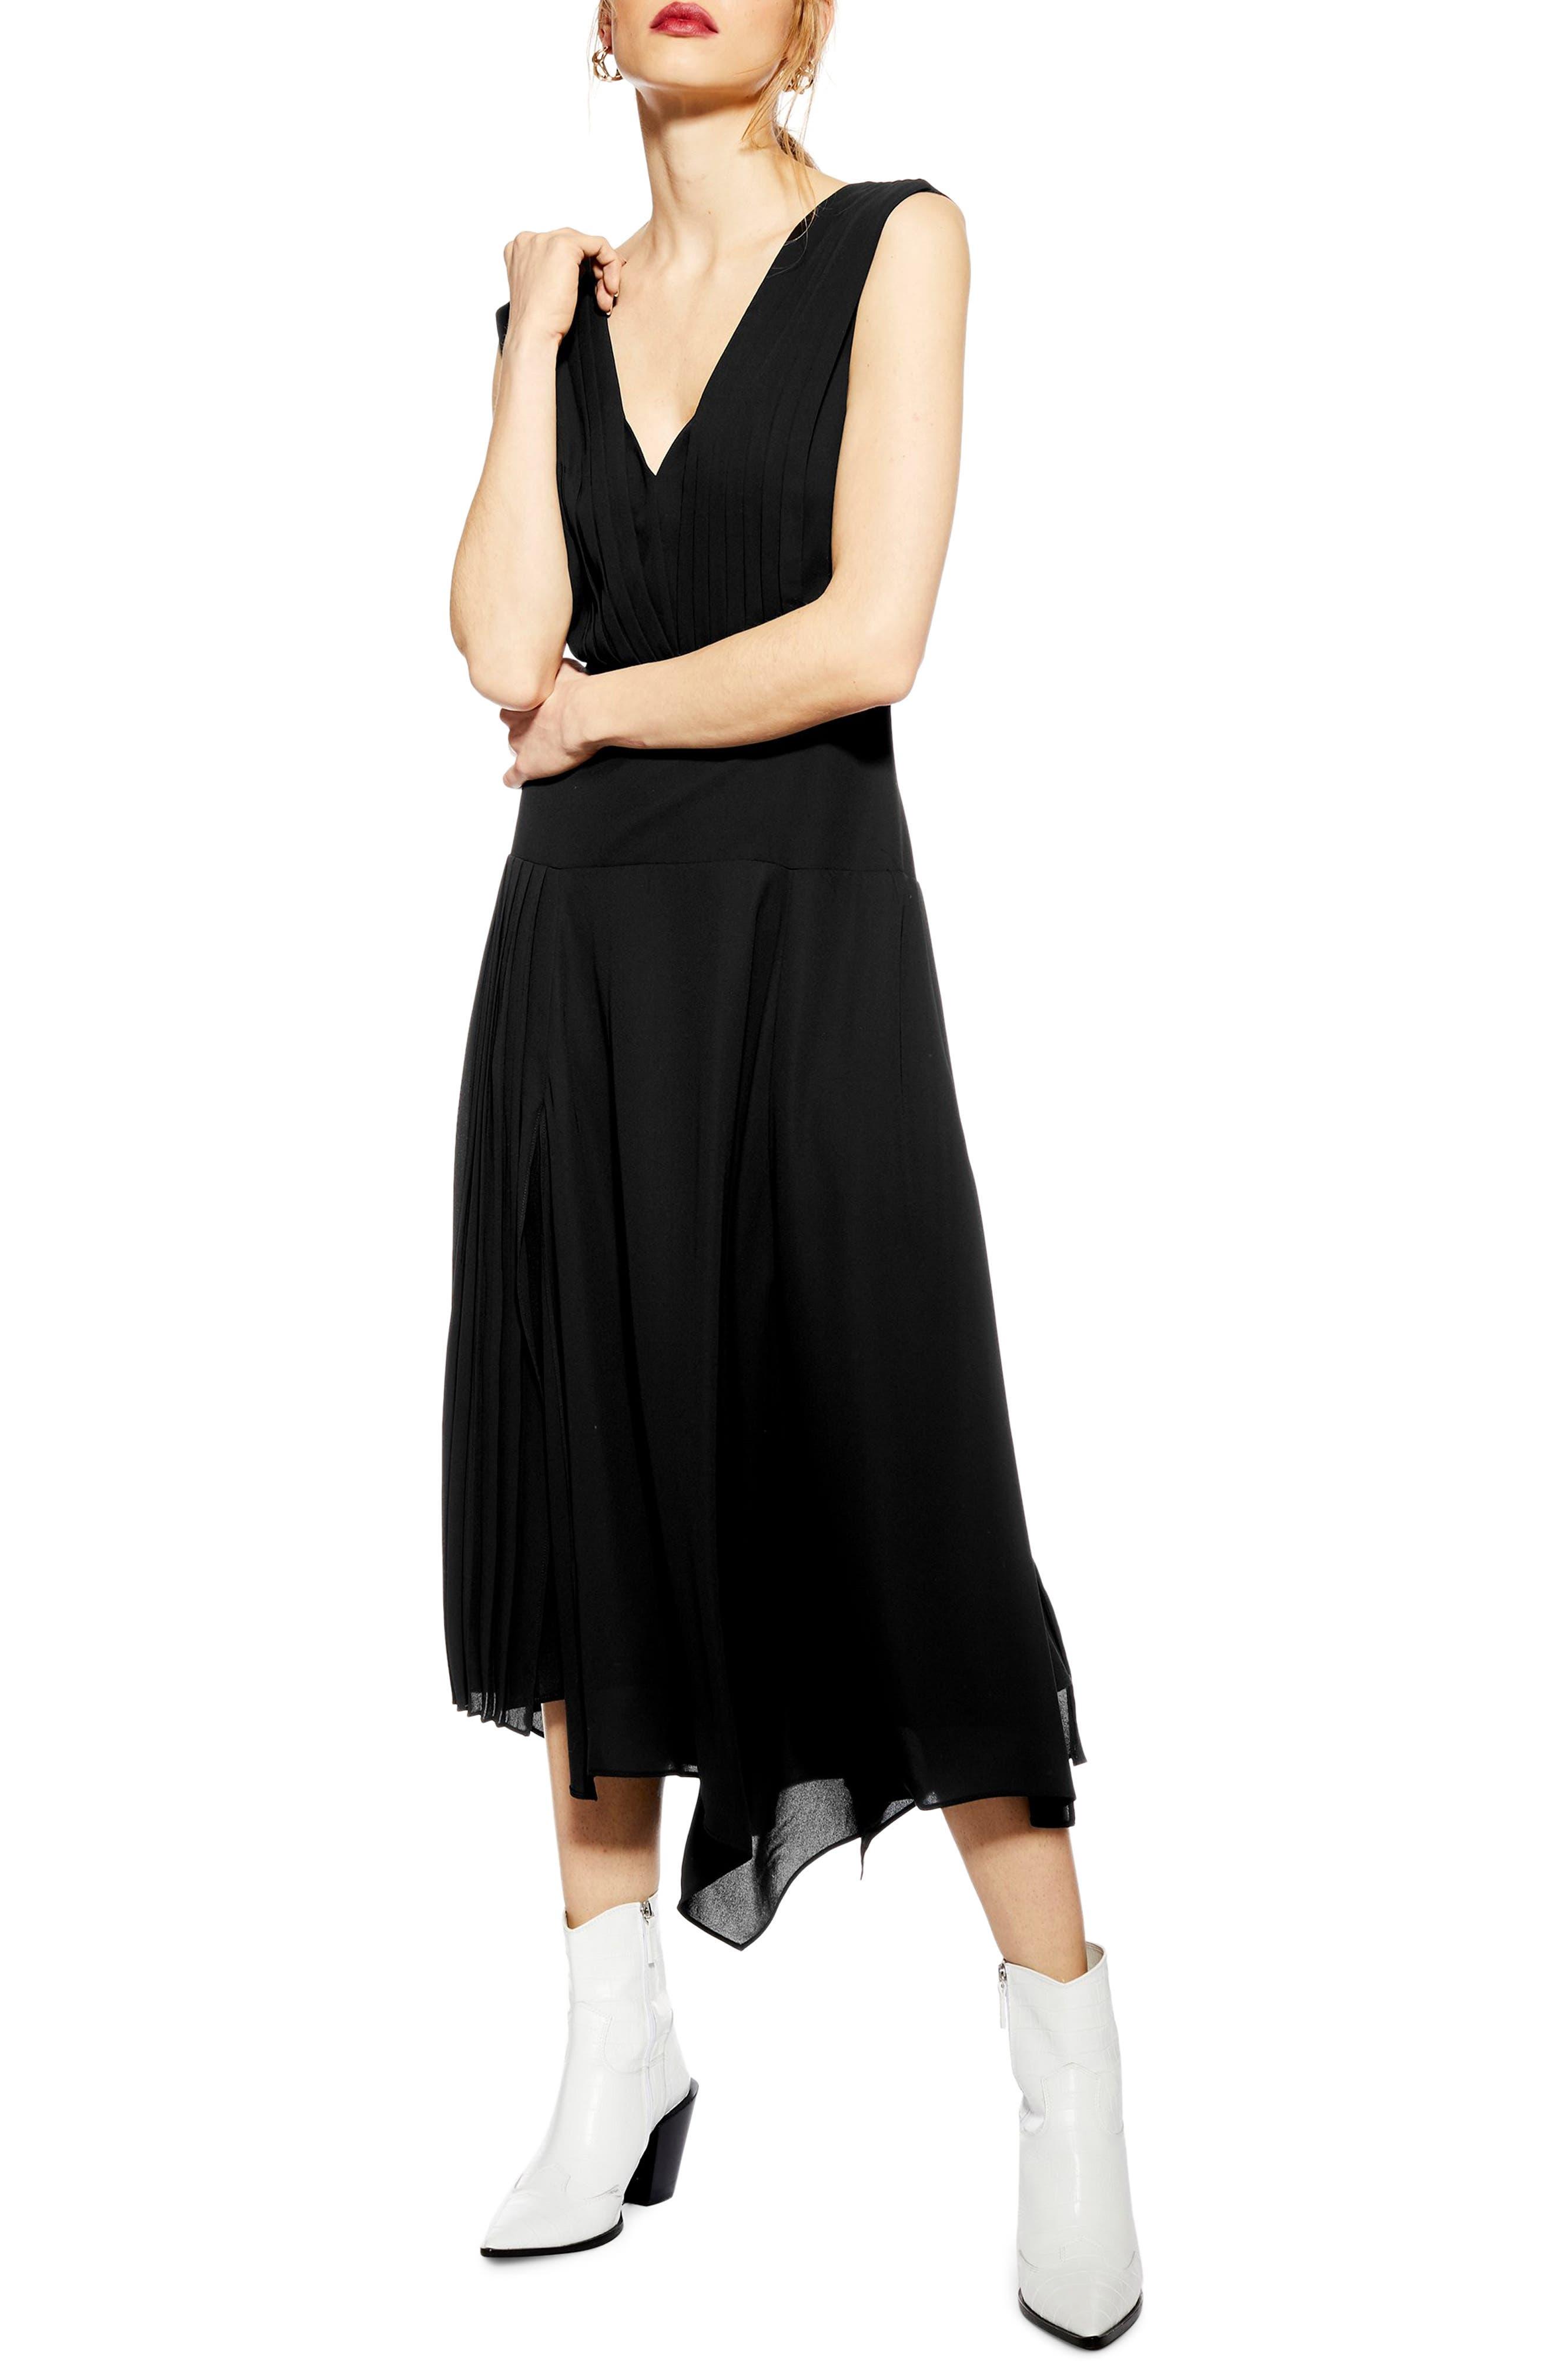 TOPSHOP, Pleated Pinafore Midi Dress, Main thumbnail 1, color, BLACK